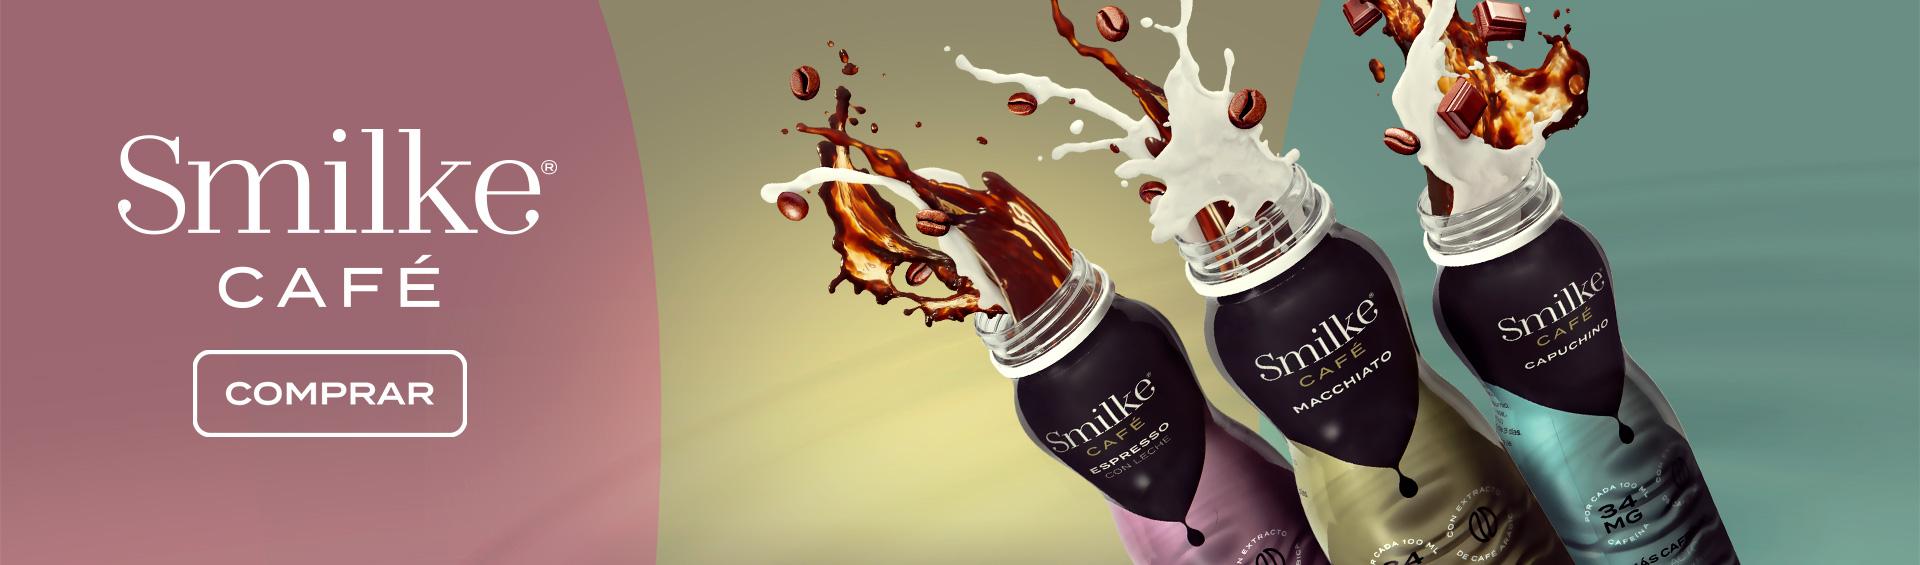 Smilke Café | Lacteos COVAP